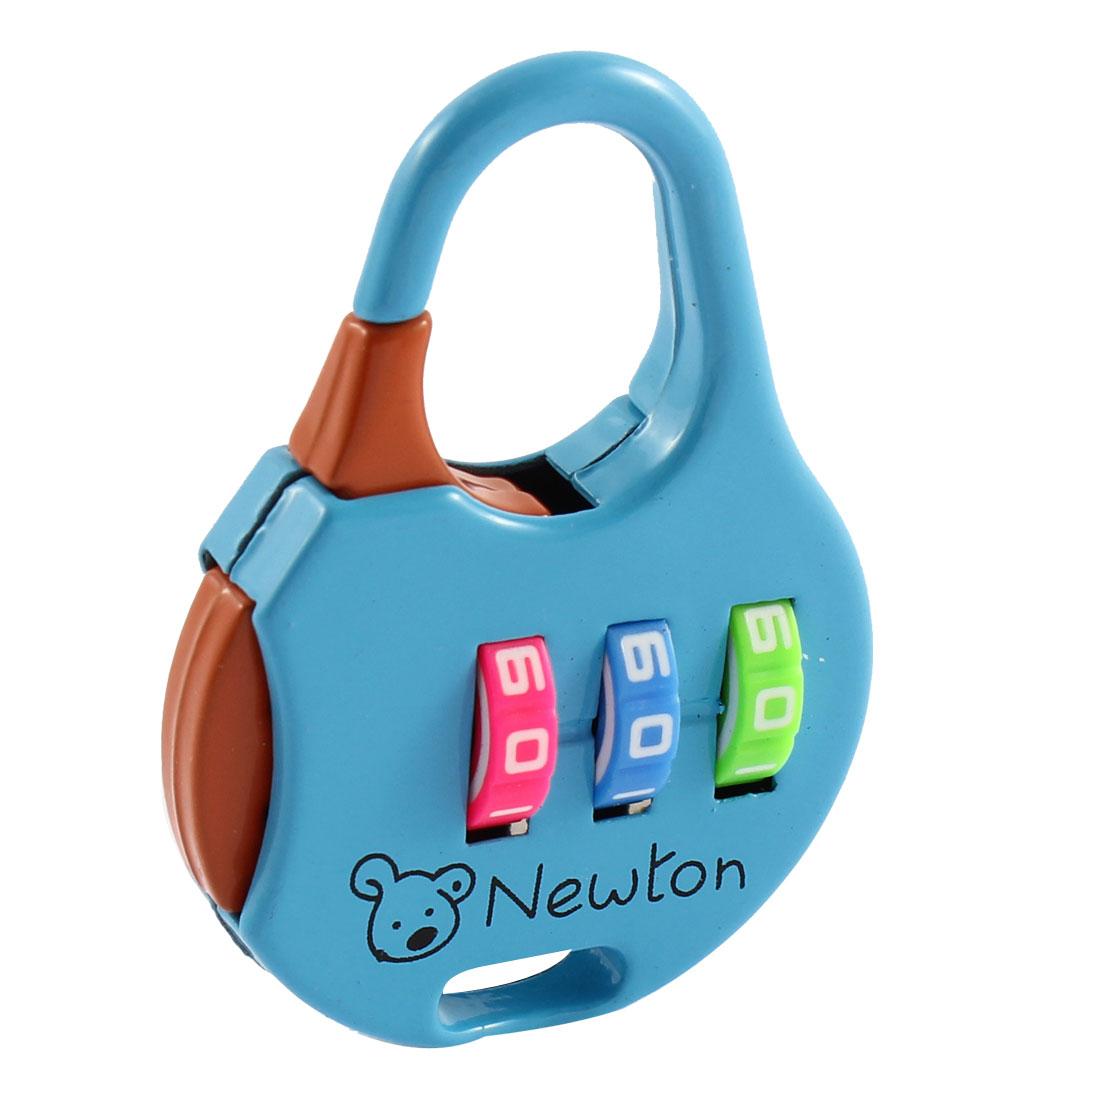 Luggage Cartoon Printed 3 Dial Digit Password Combination Lock Padlock Blue